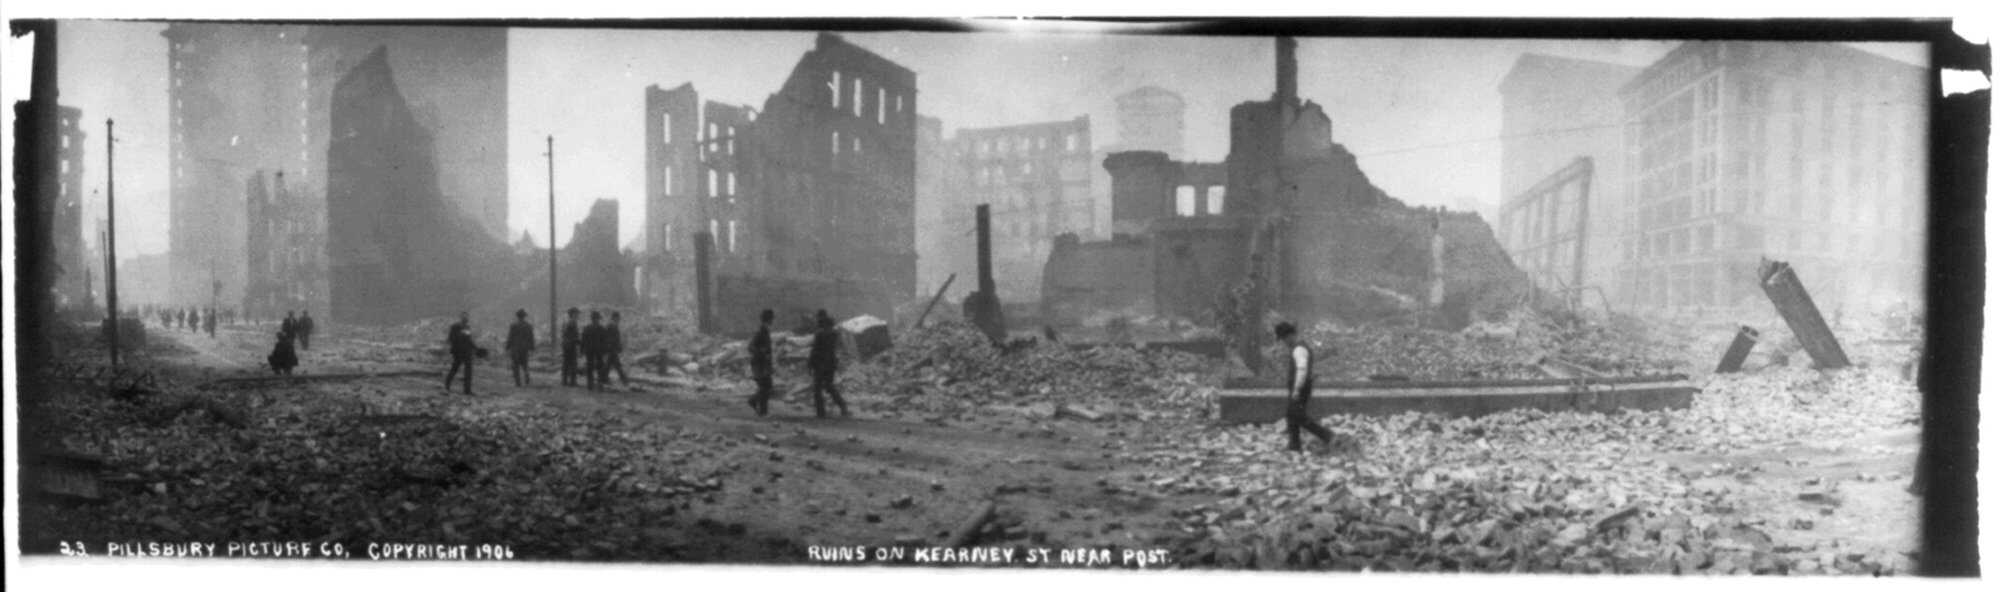 Ansel San Francisco - Earthquake & fire, 1906 %22Ruins on Kearney St. near Post 1906 LOC.jpg